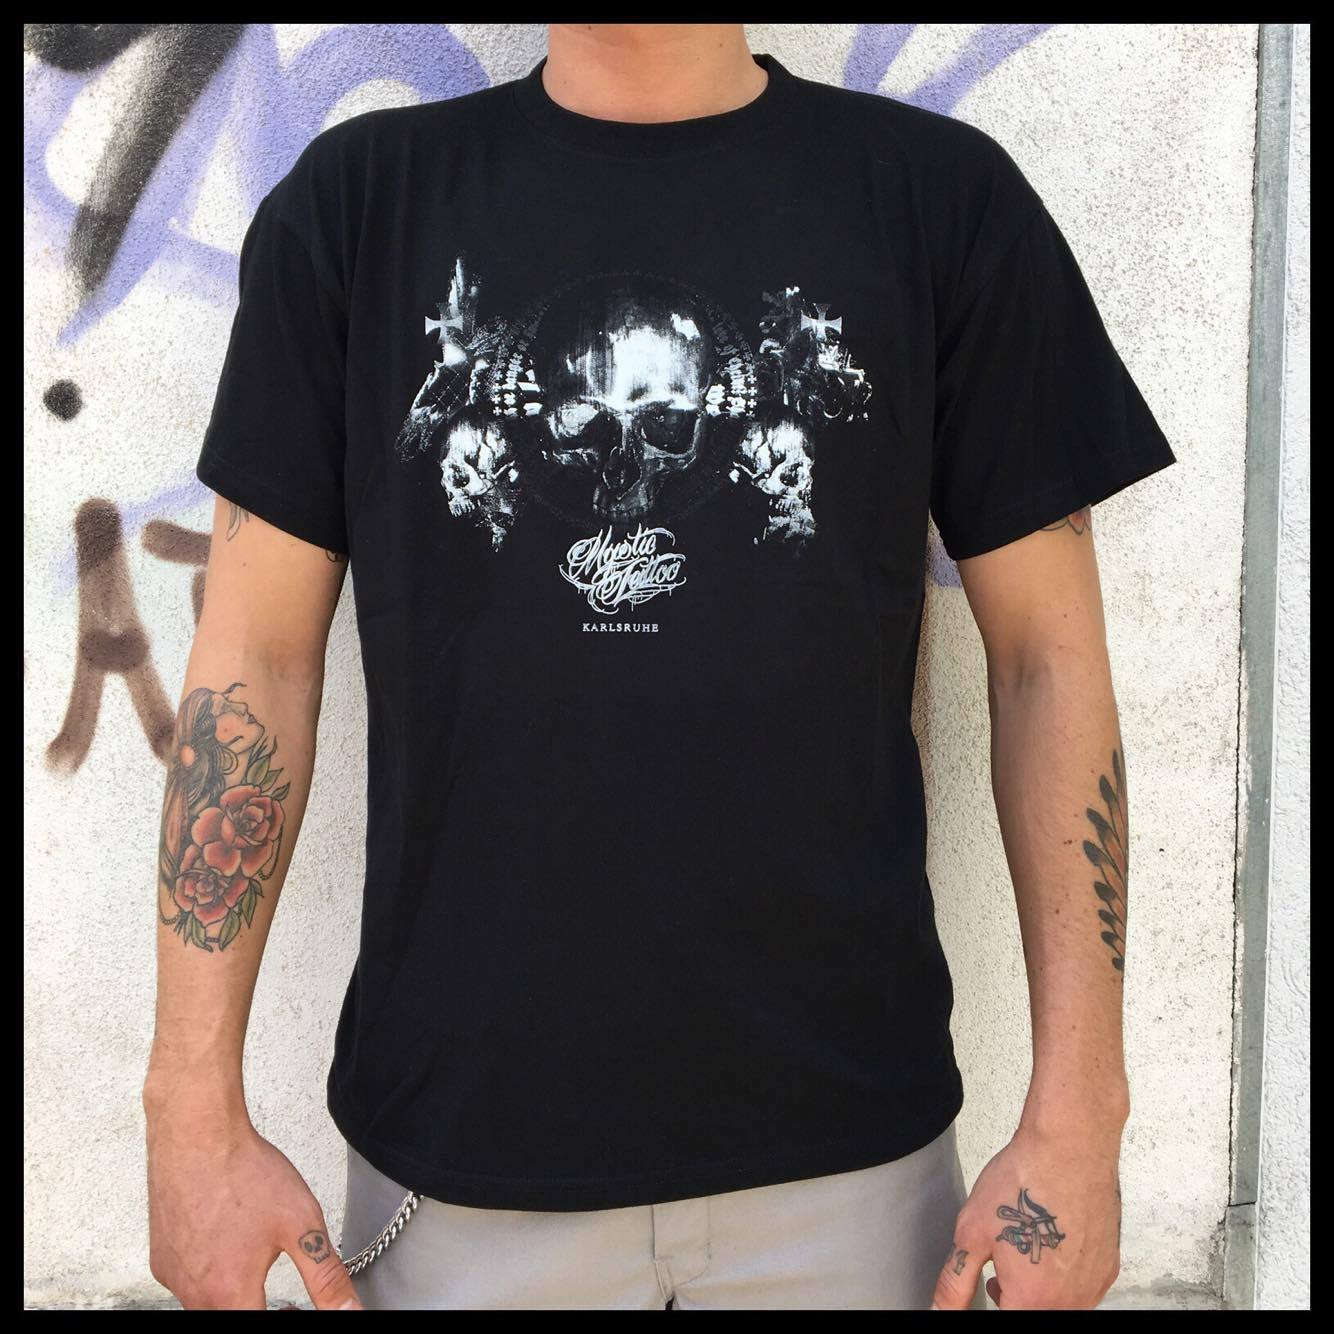 Men Shirt V Neck, Siebdruck S / M / L / XL / XXL - Preis 20 €